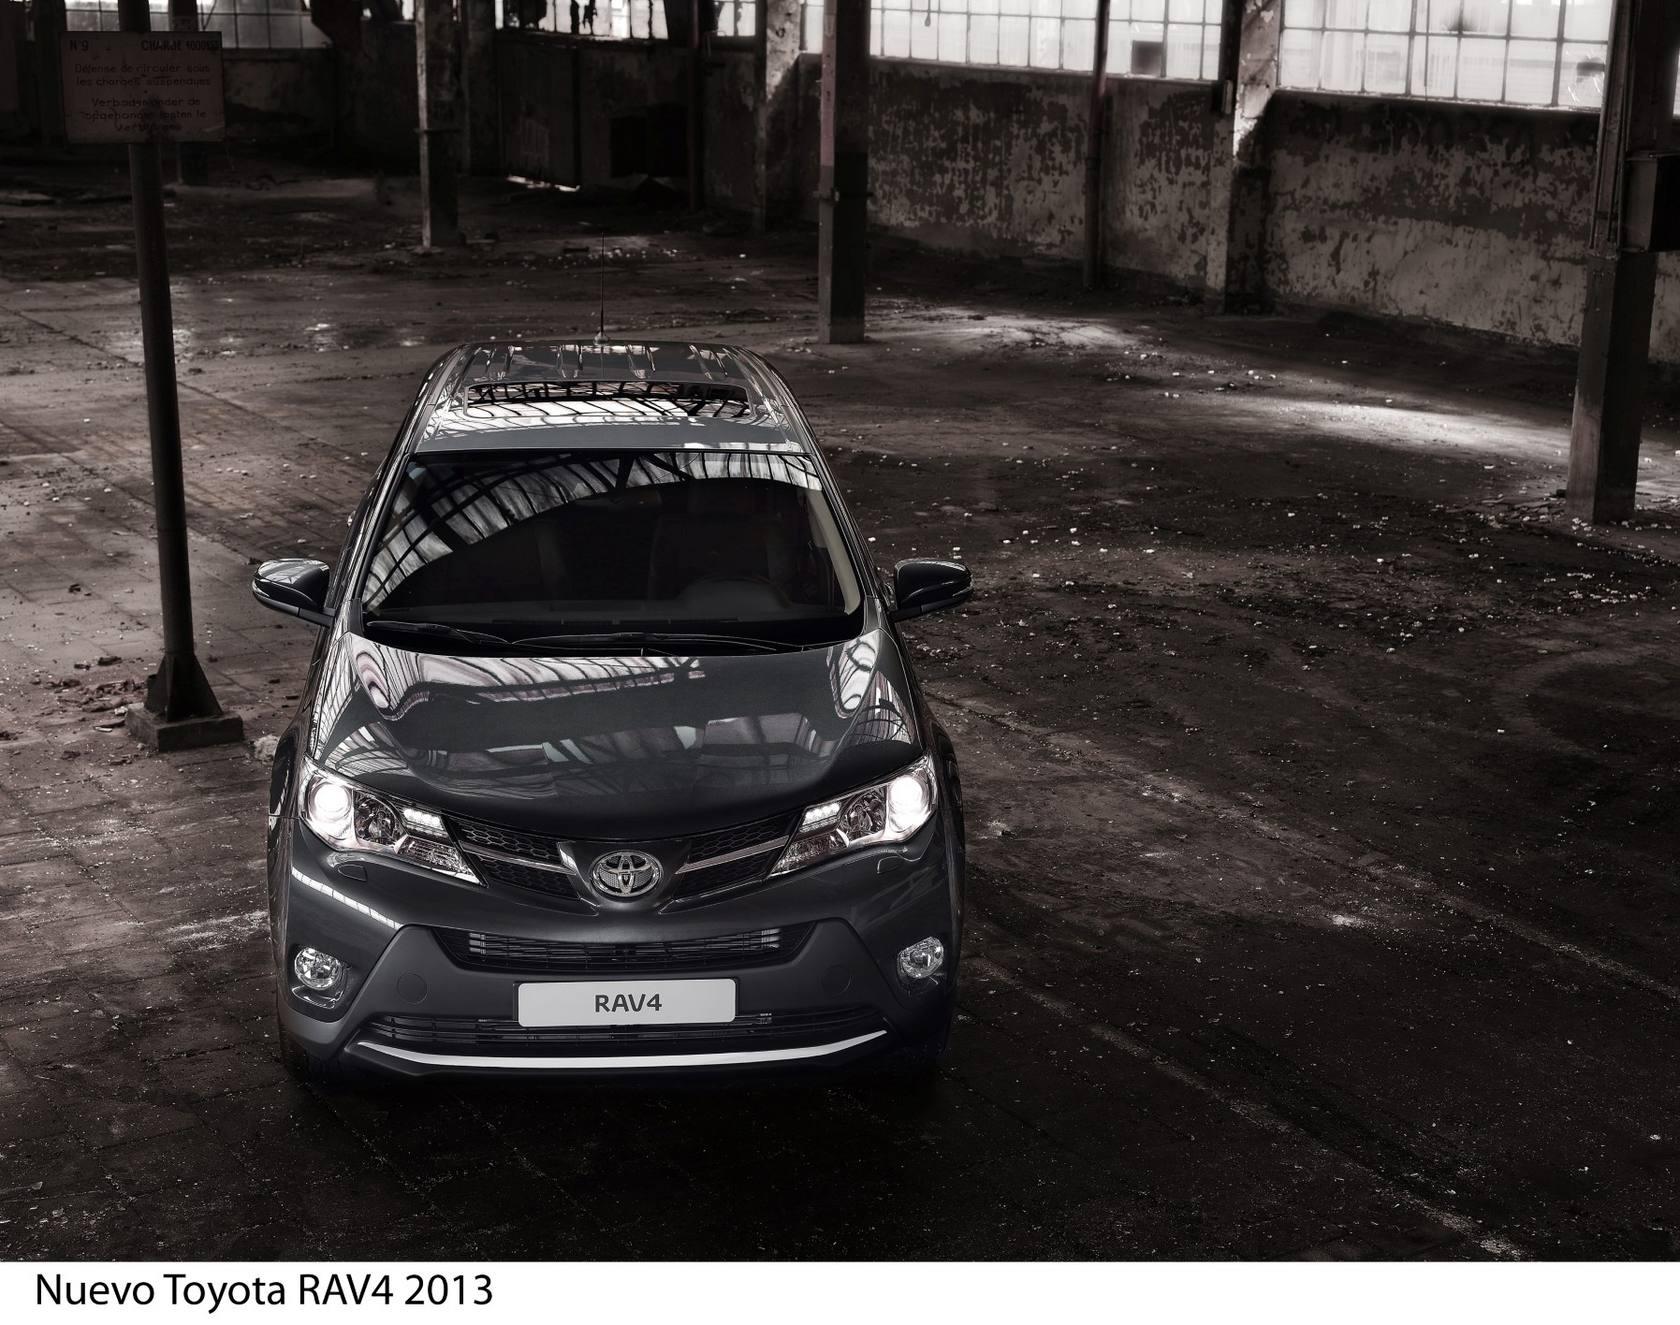 Nuevo Toyota RAV4